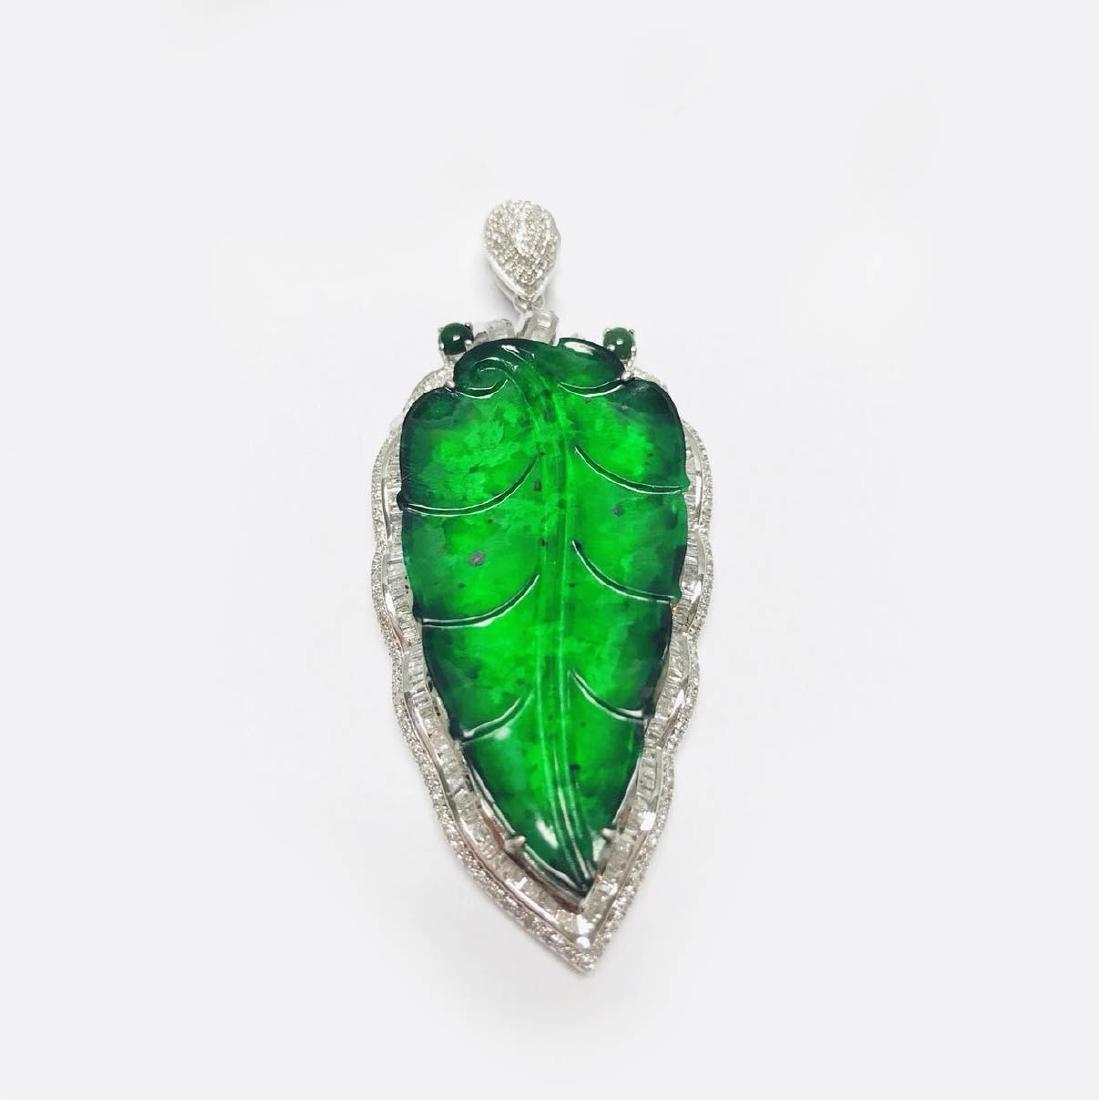 Certified 18K white gold Natural Burma Jadeite leaf pen